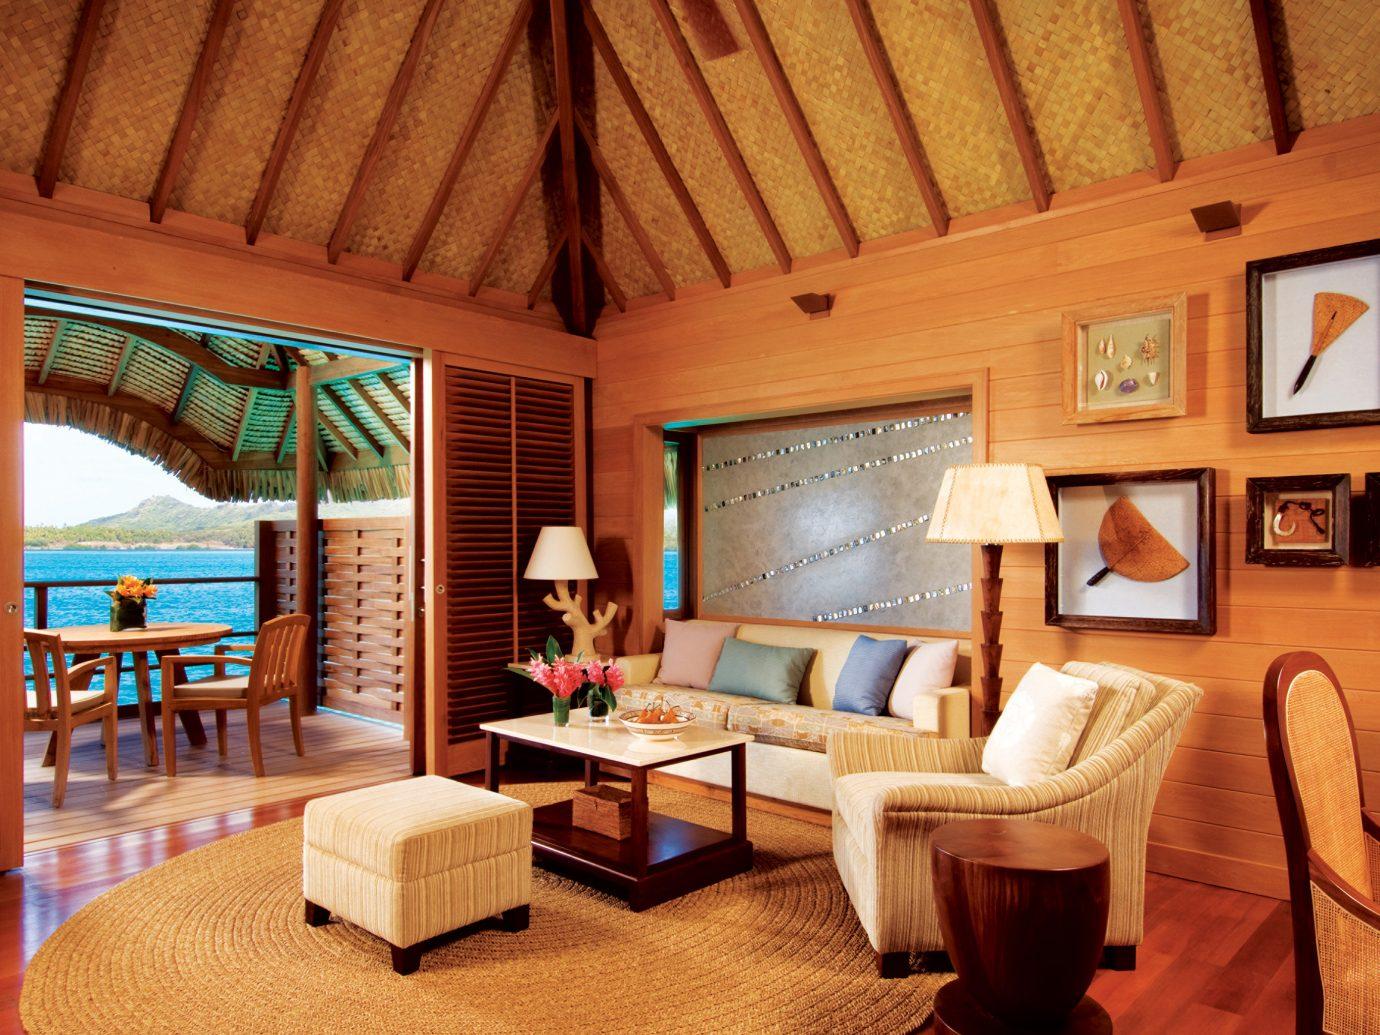 Hotels Living Luxury Trip Ideas floor indoor room property ceiling chair Resort estate cottage Villa living room interior design Suite real estate farmhouse furniture area decorated